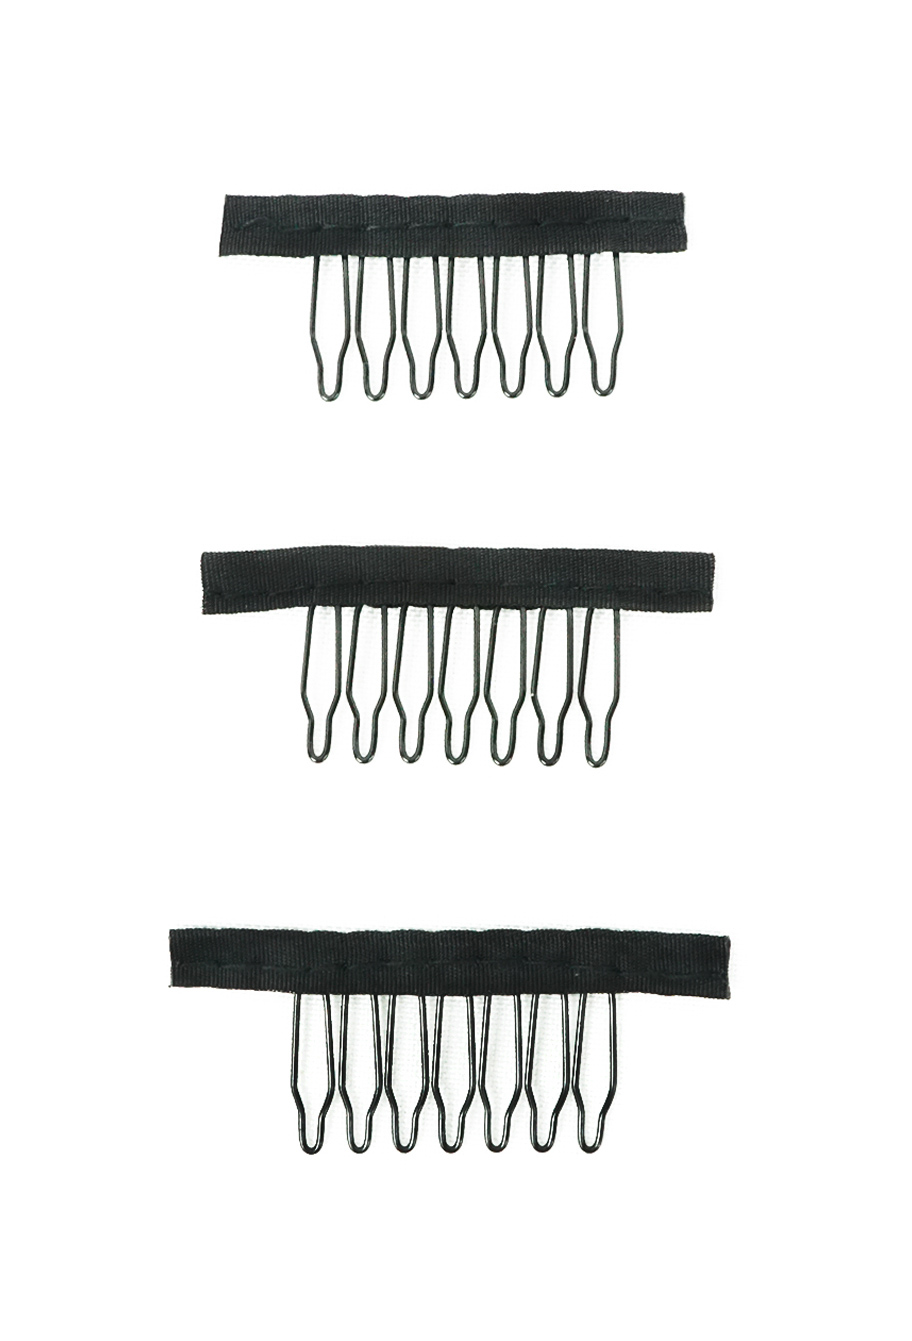 Trio Pente para Perucas Wigs e Laces